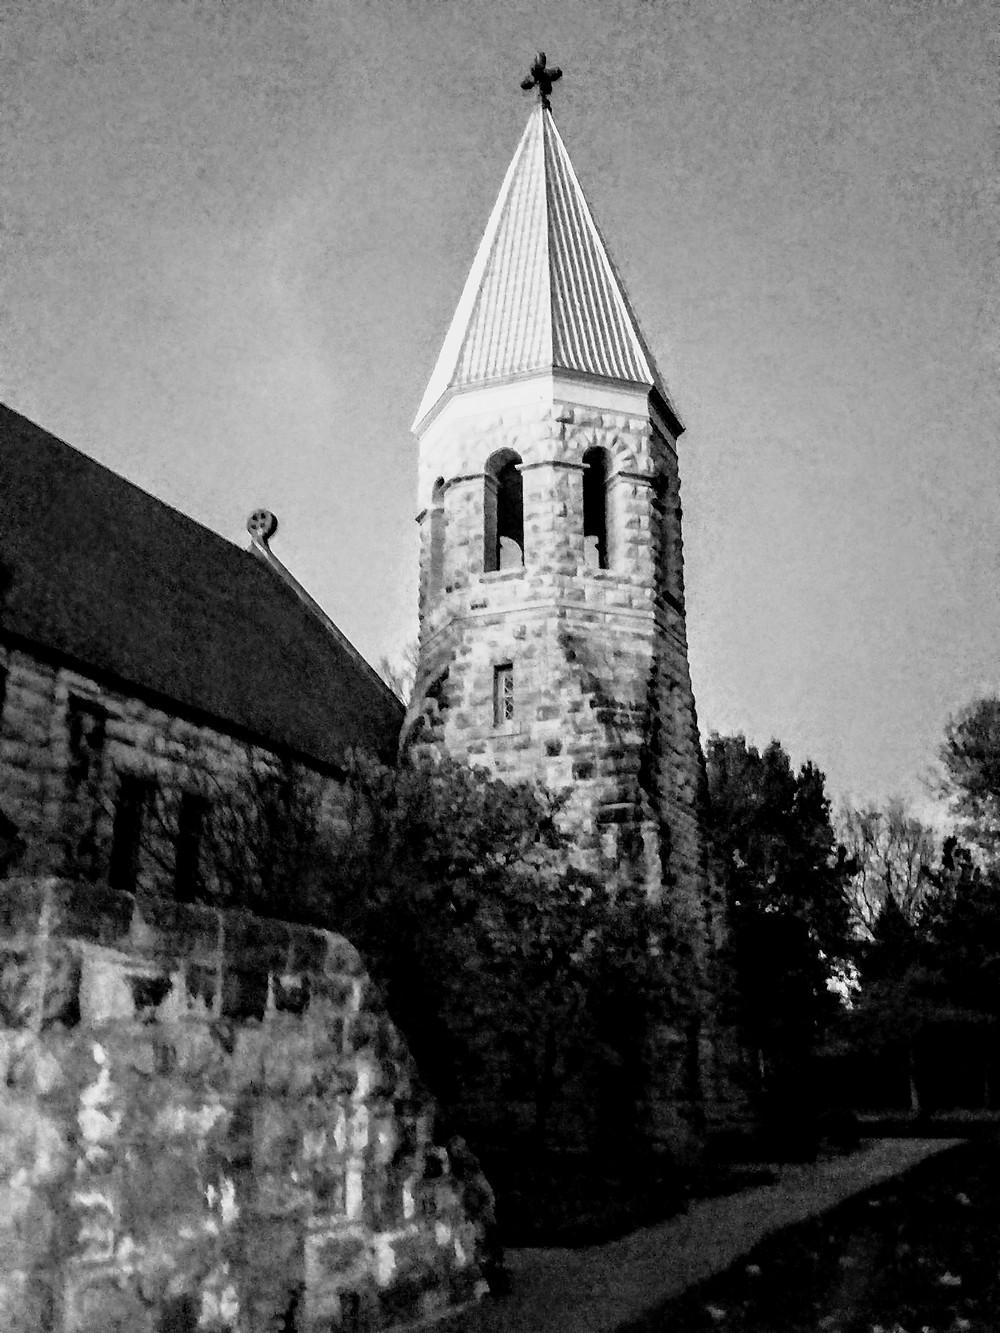 Ft. Riley Kansas Historical Society Ghost Tour sights, main post, chapel